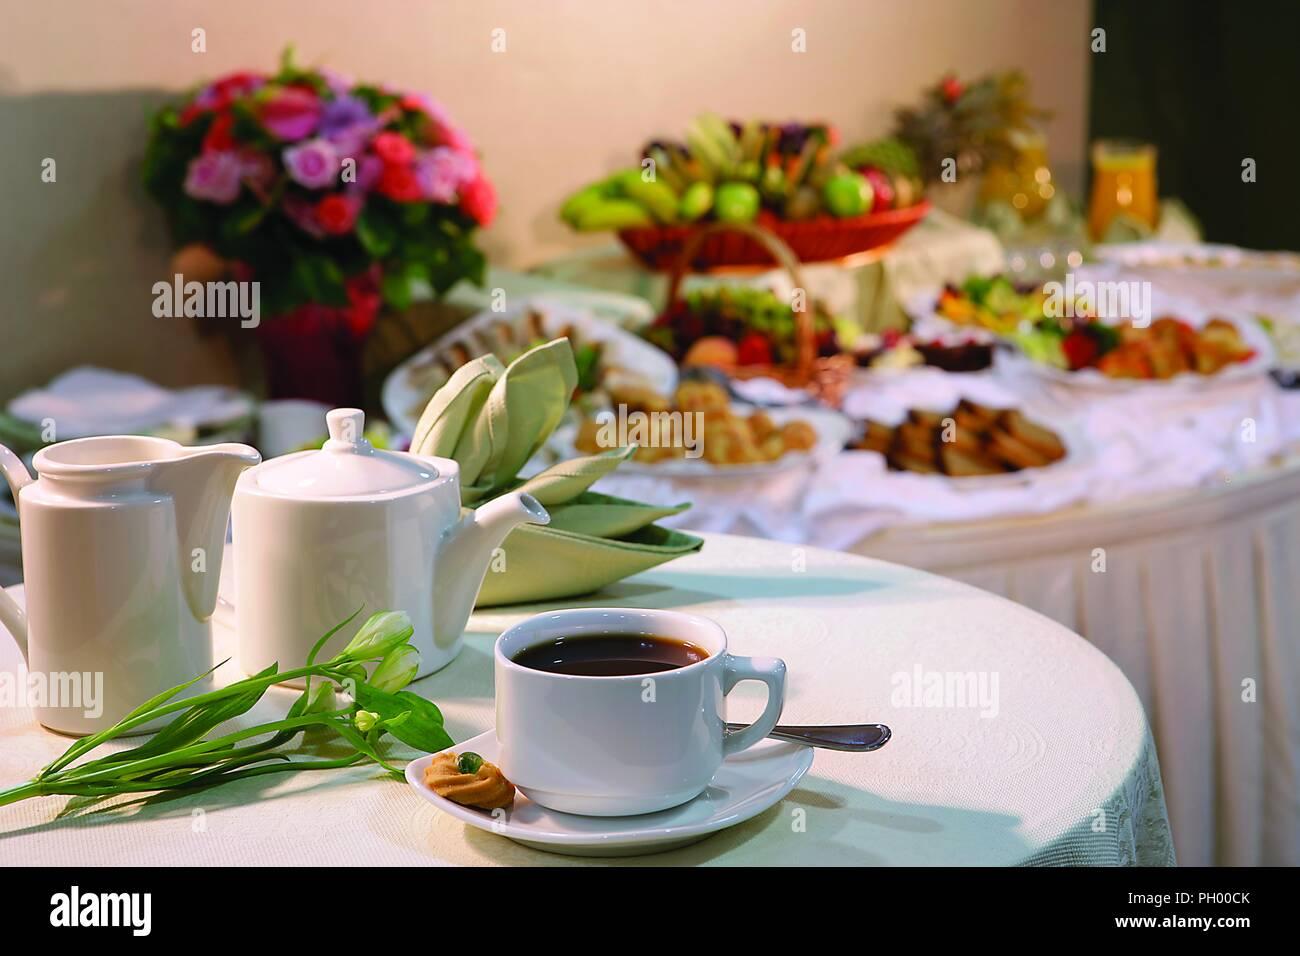 Beber café - Desayuno Imagen De Stock